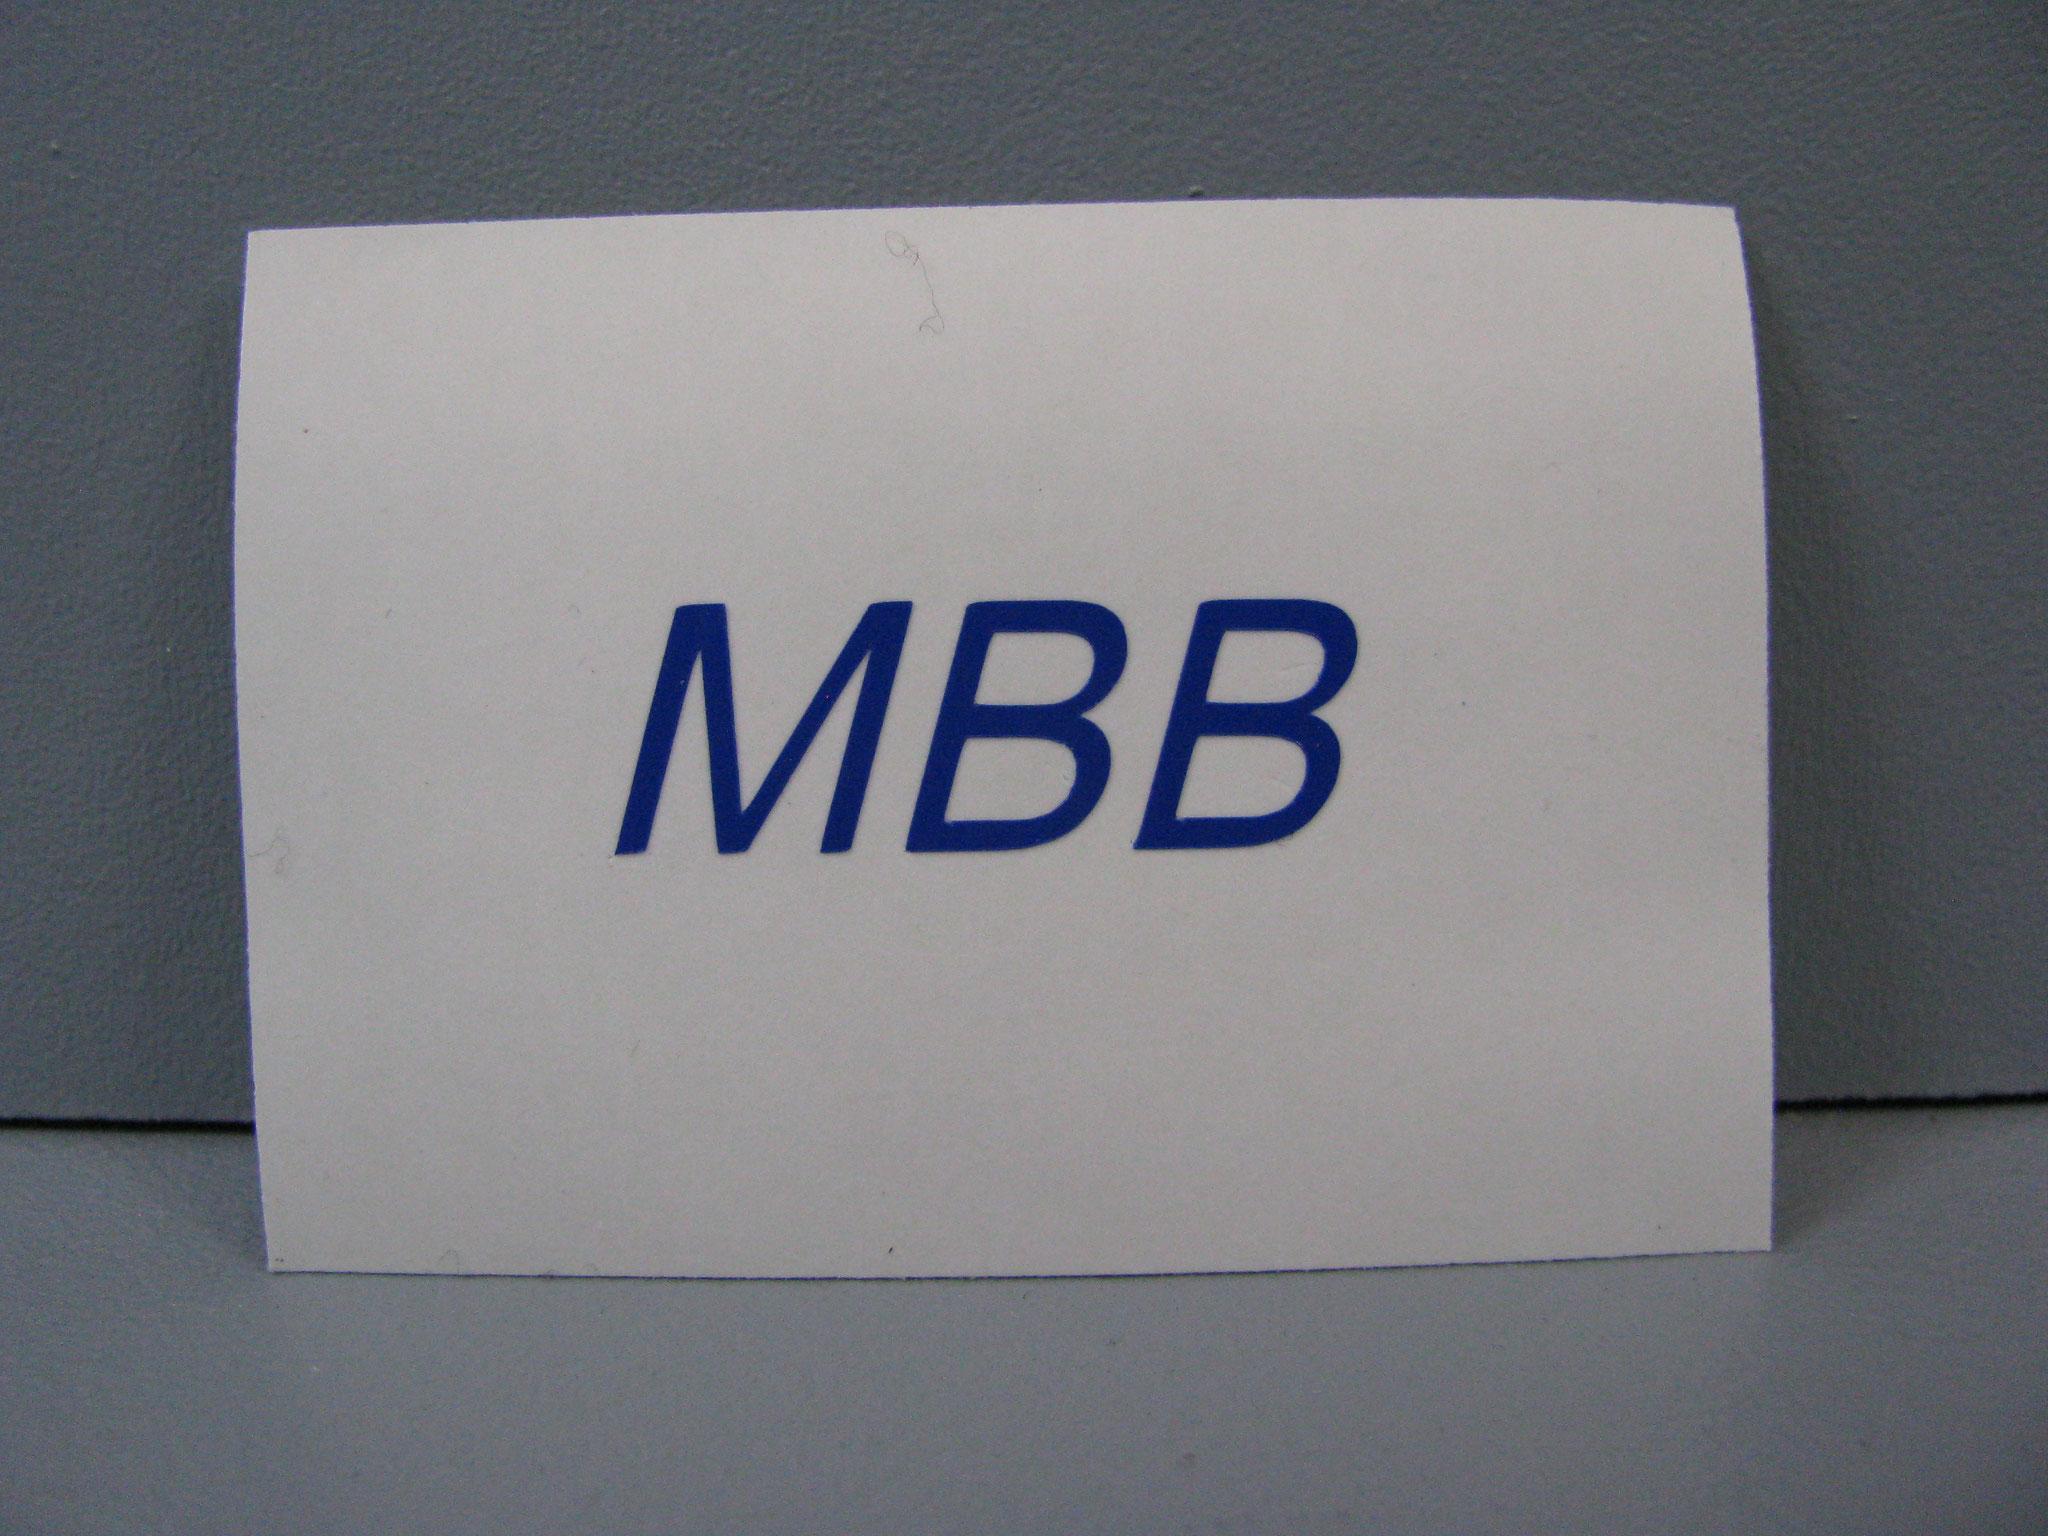 M309: MBB, kursiv, z.B. 30x10mm